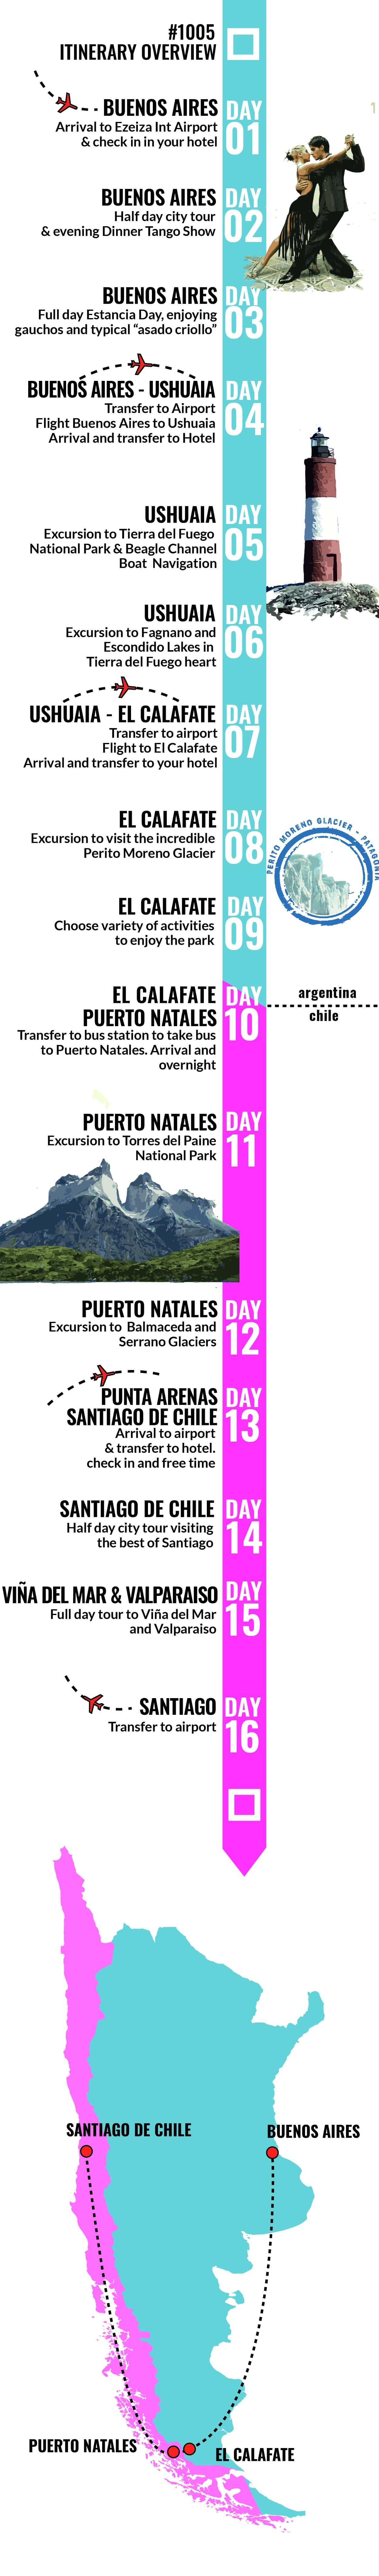 Buenos Aires, Ushuaia, El Calafate, Puerto  Natales and Torres del Paine, Santiago - RipioTurismo DMC for Argentina and Chile